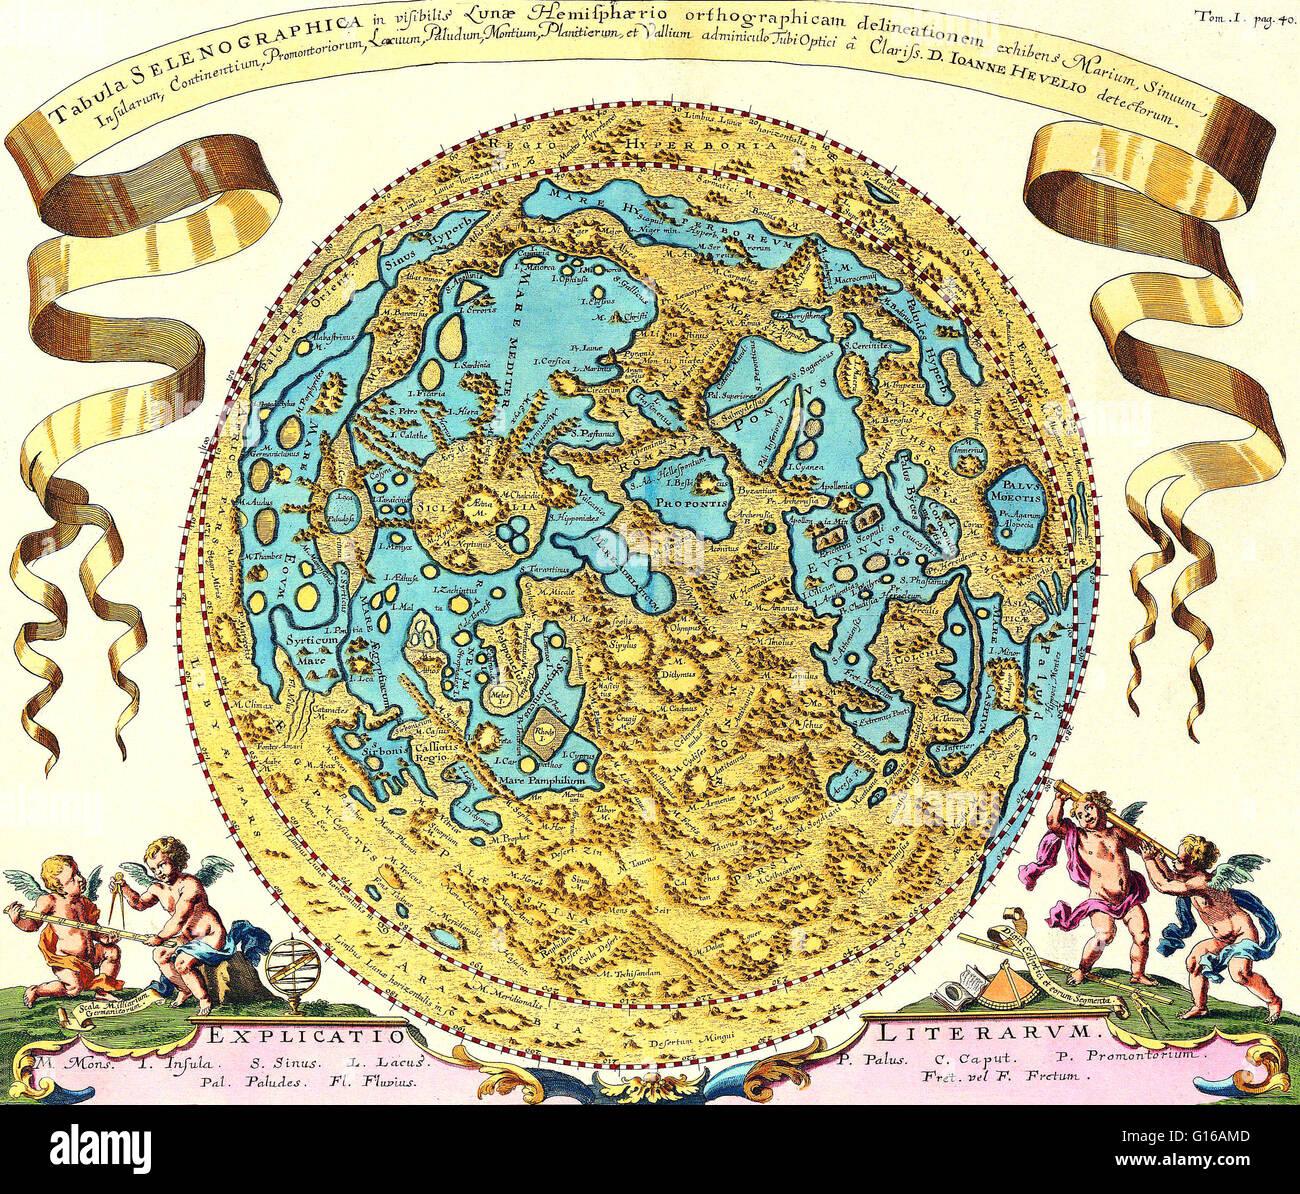 Map of the moon originally appeared in 'Selenographia sive lunae descriptio' by Johannes Hevelius, 1647. - Stock Image